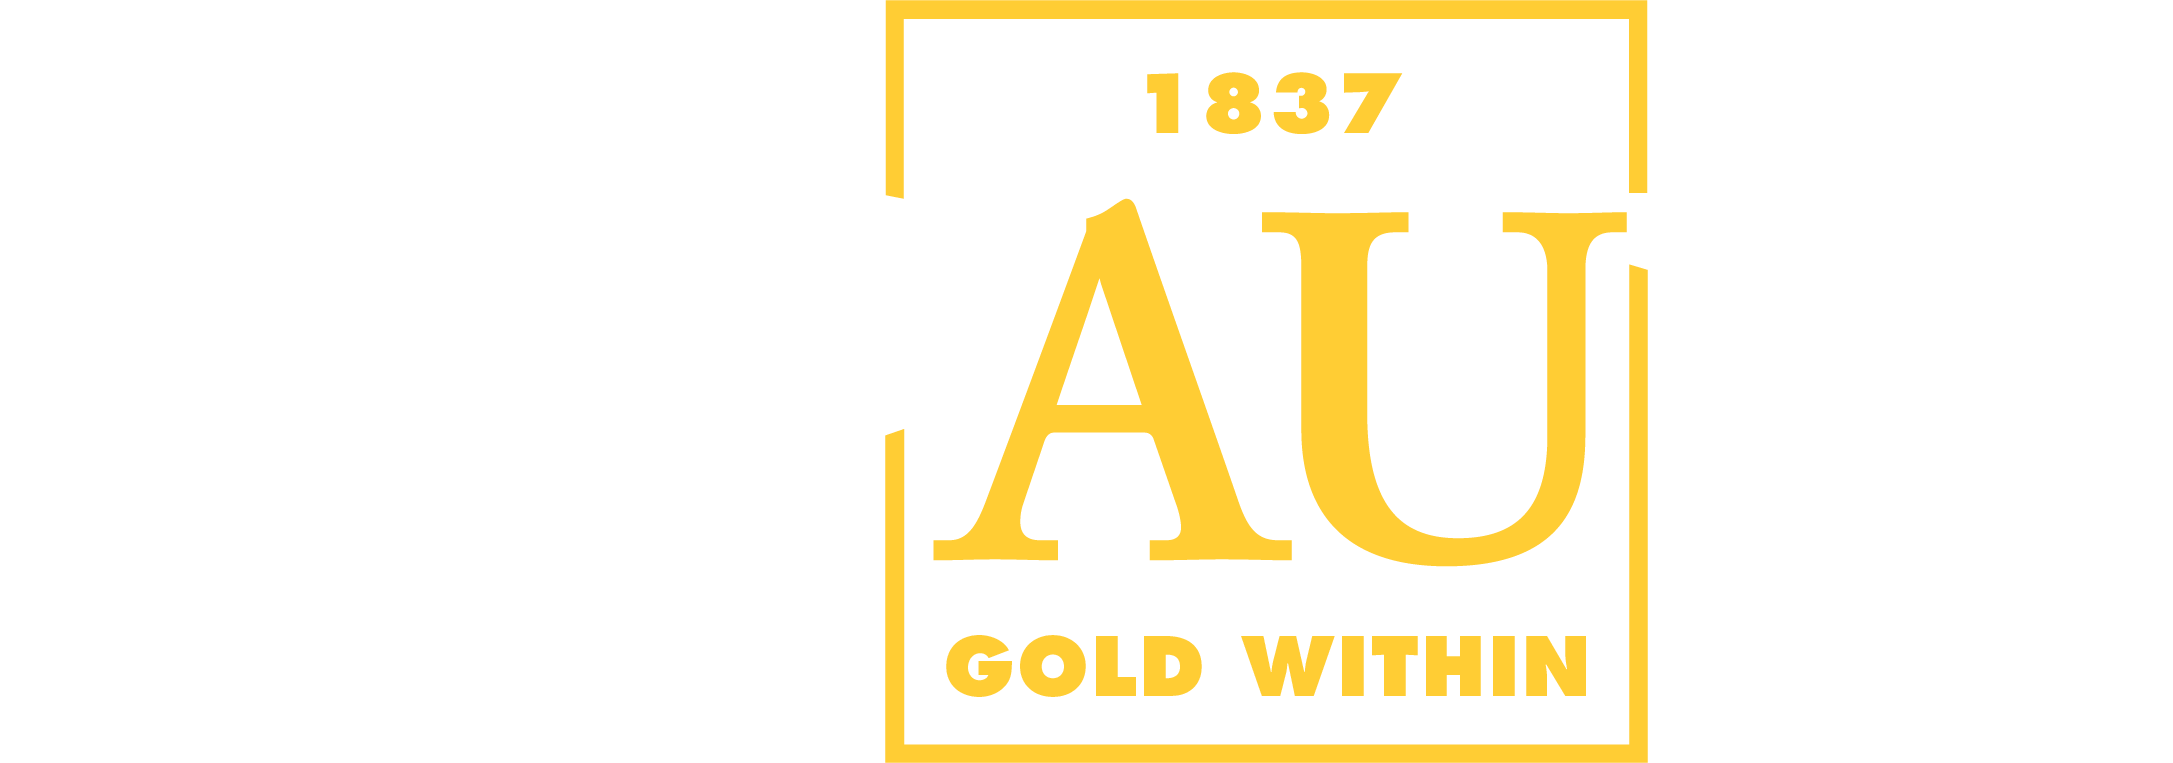 DePauw Gold Within Logo